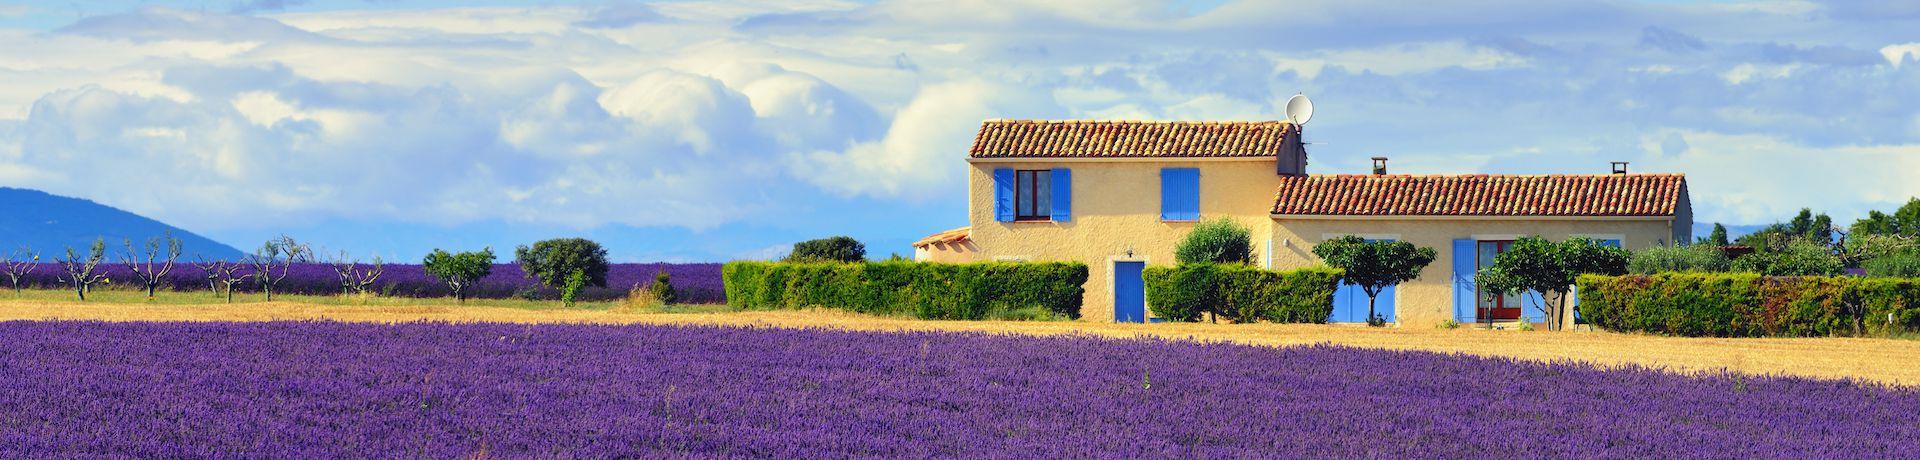 Supertrips - Tipi's Frankrijk